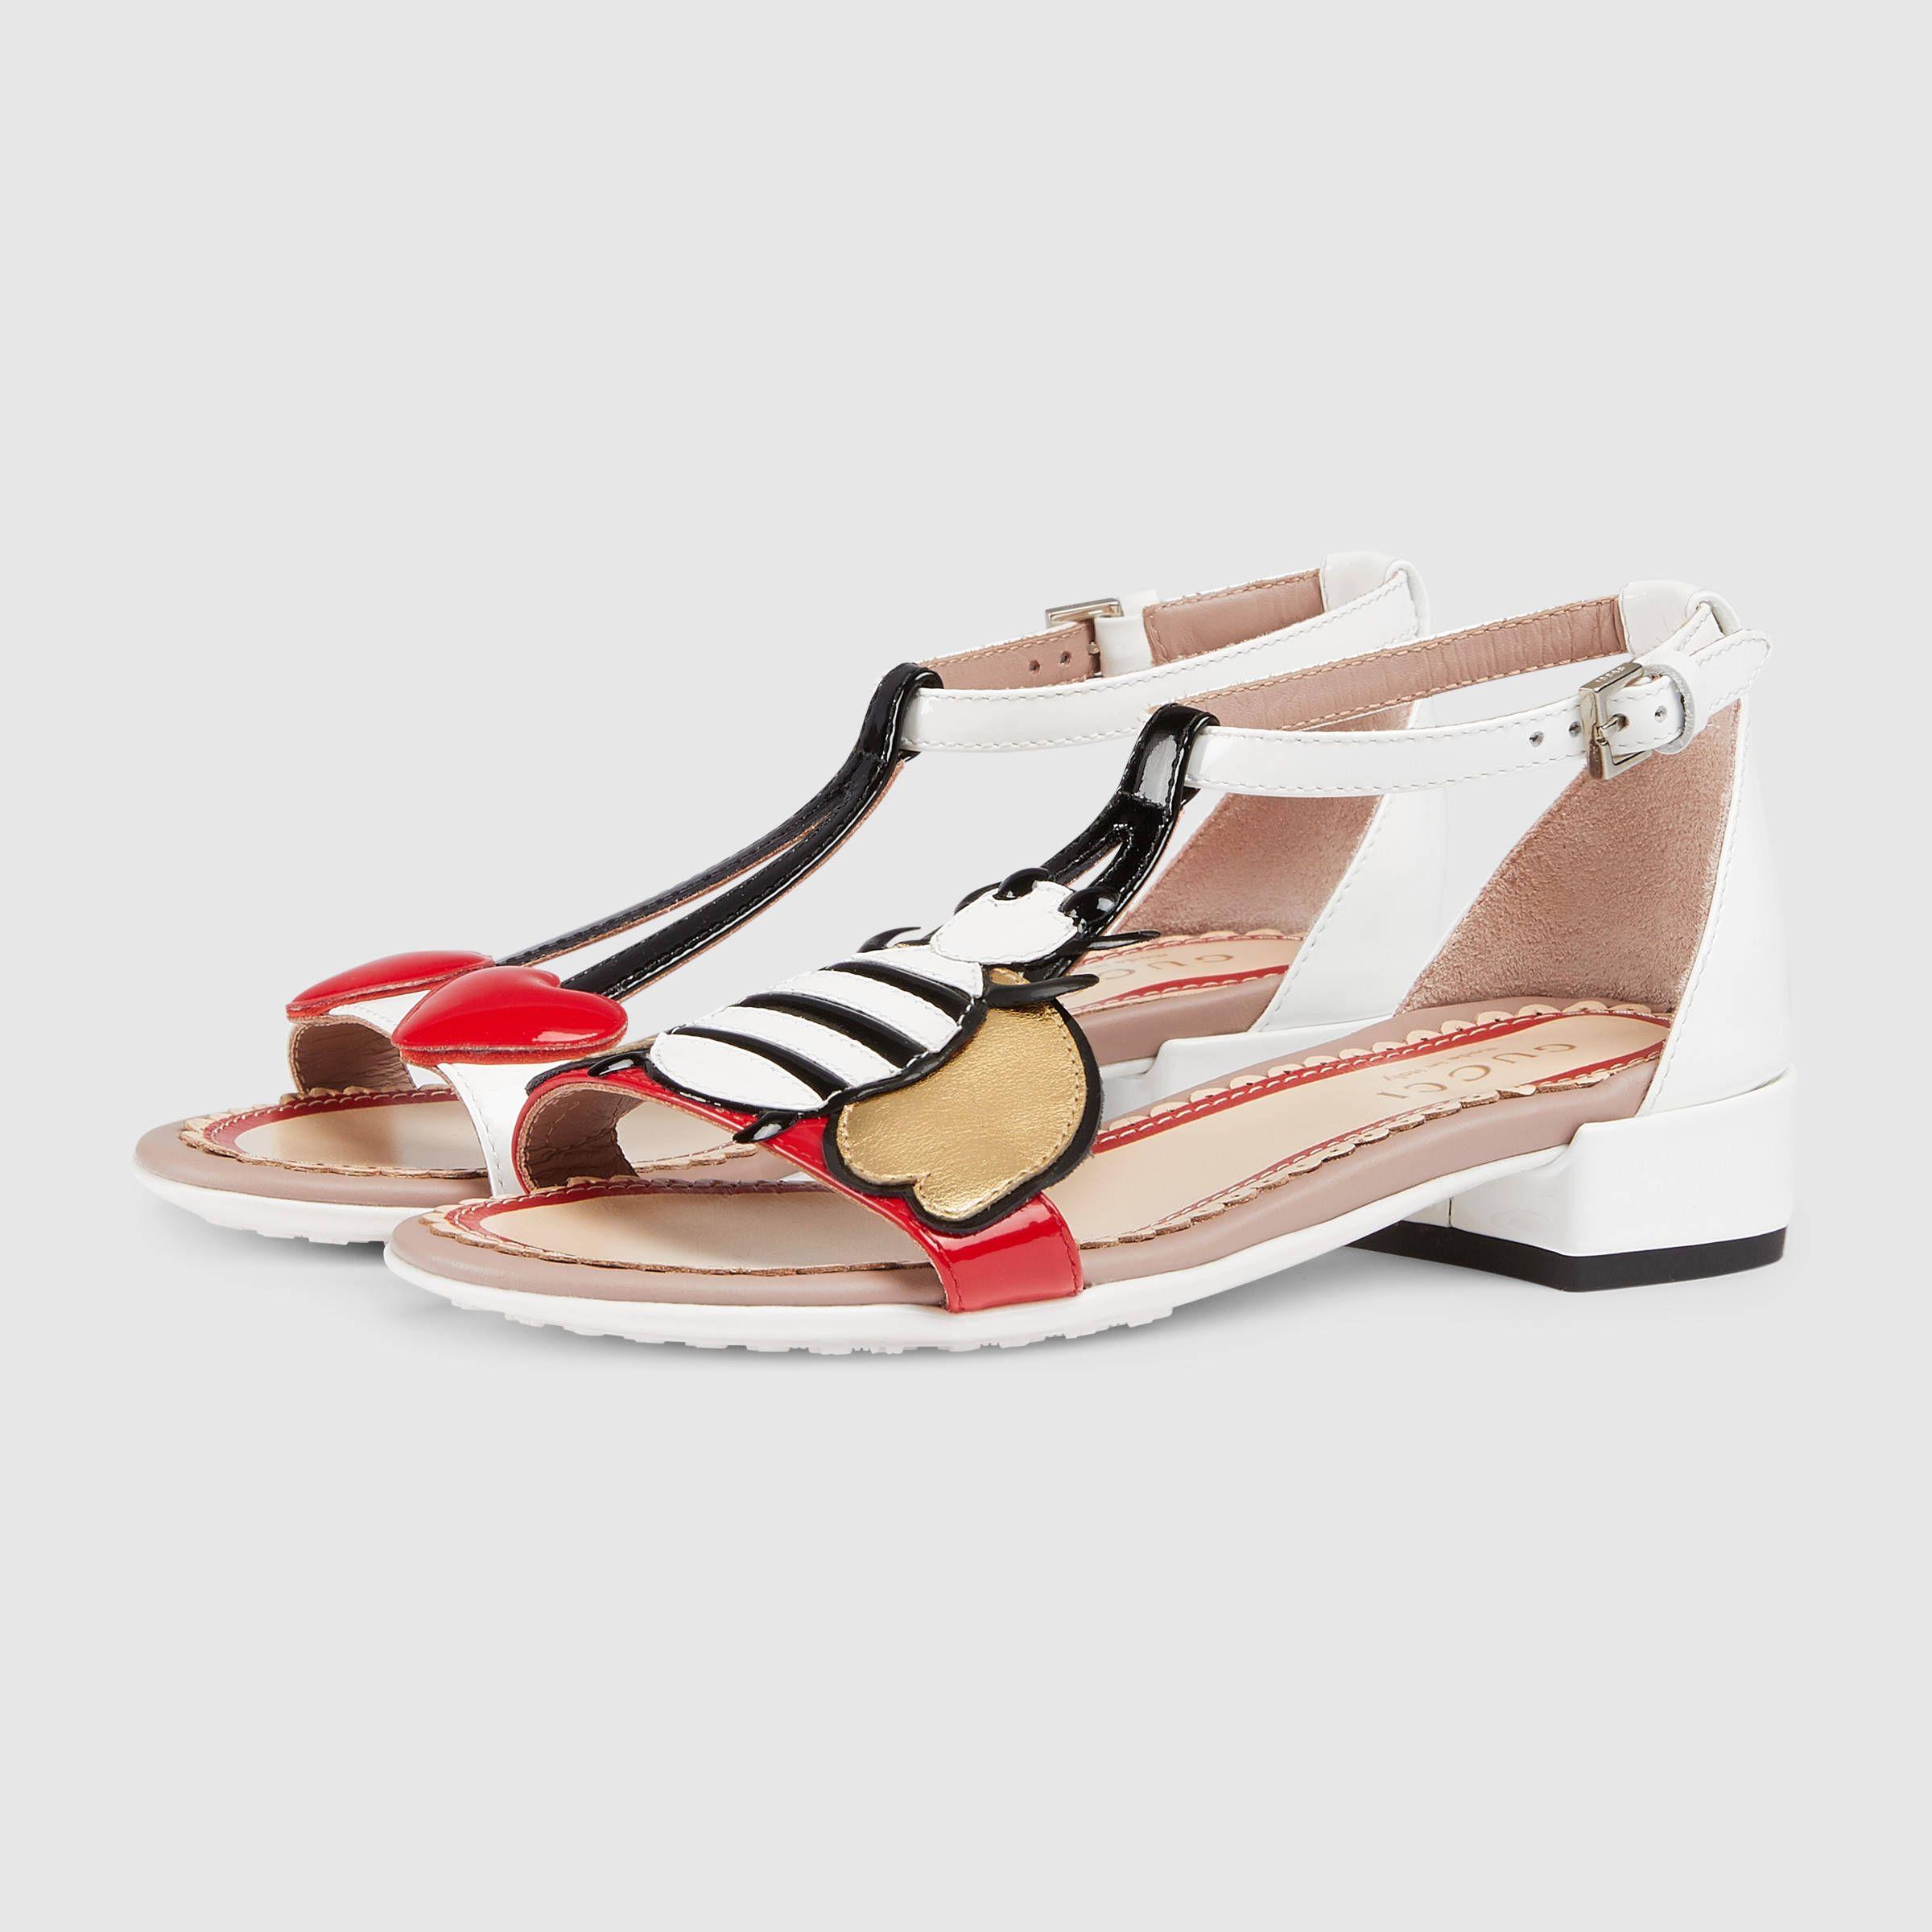 5fe8296364bc Gucci Children s patent leather sandal Detail 6 Girls Sandals